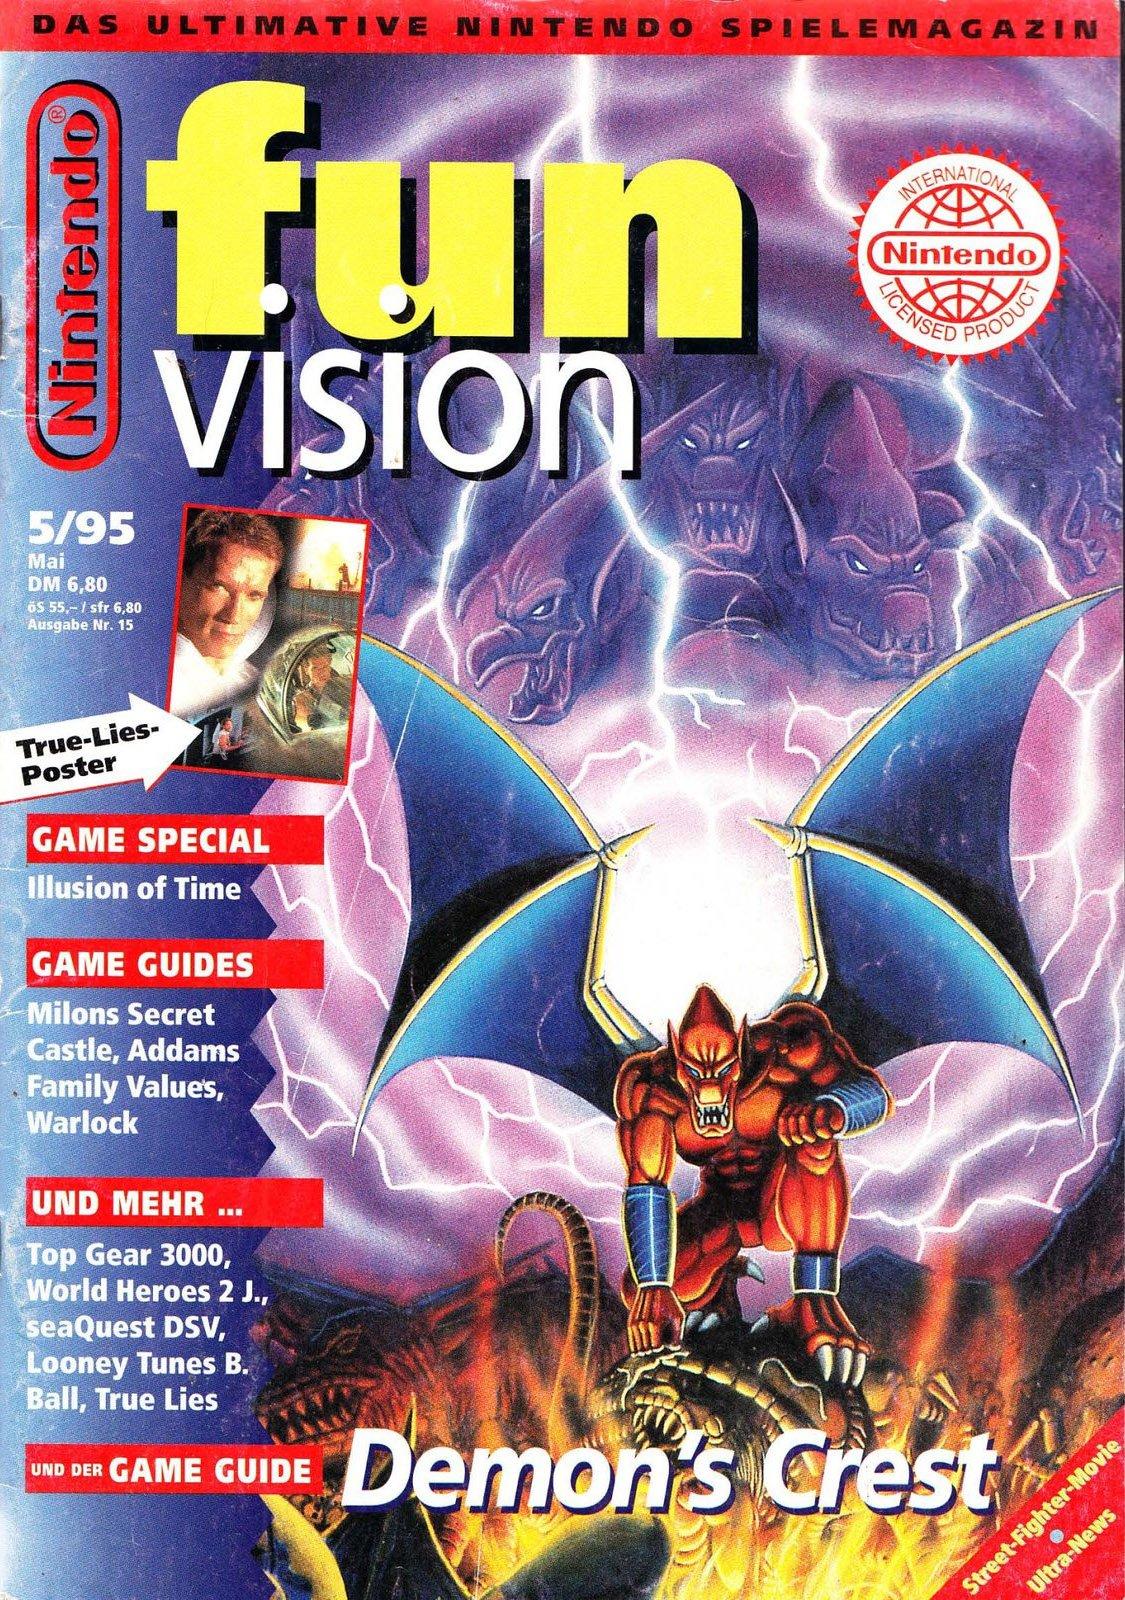 Nintendo Fun Vision Issue 15 (May 1995)